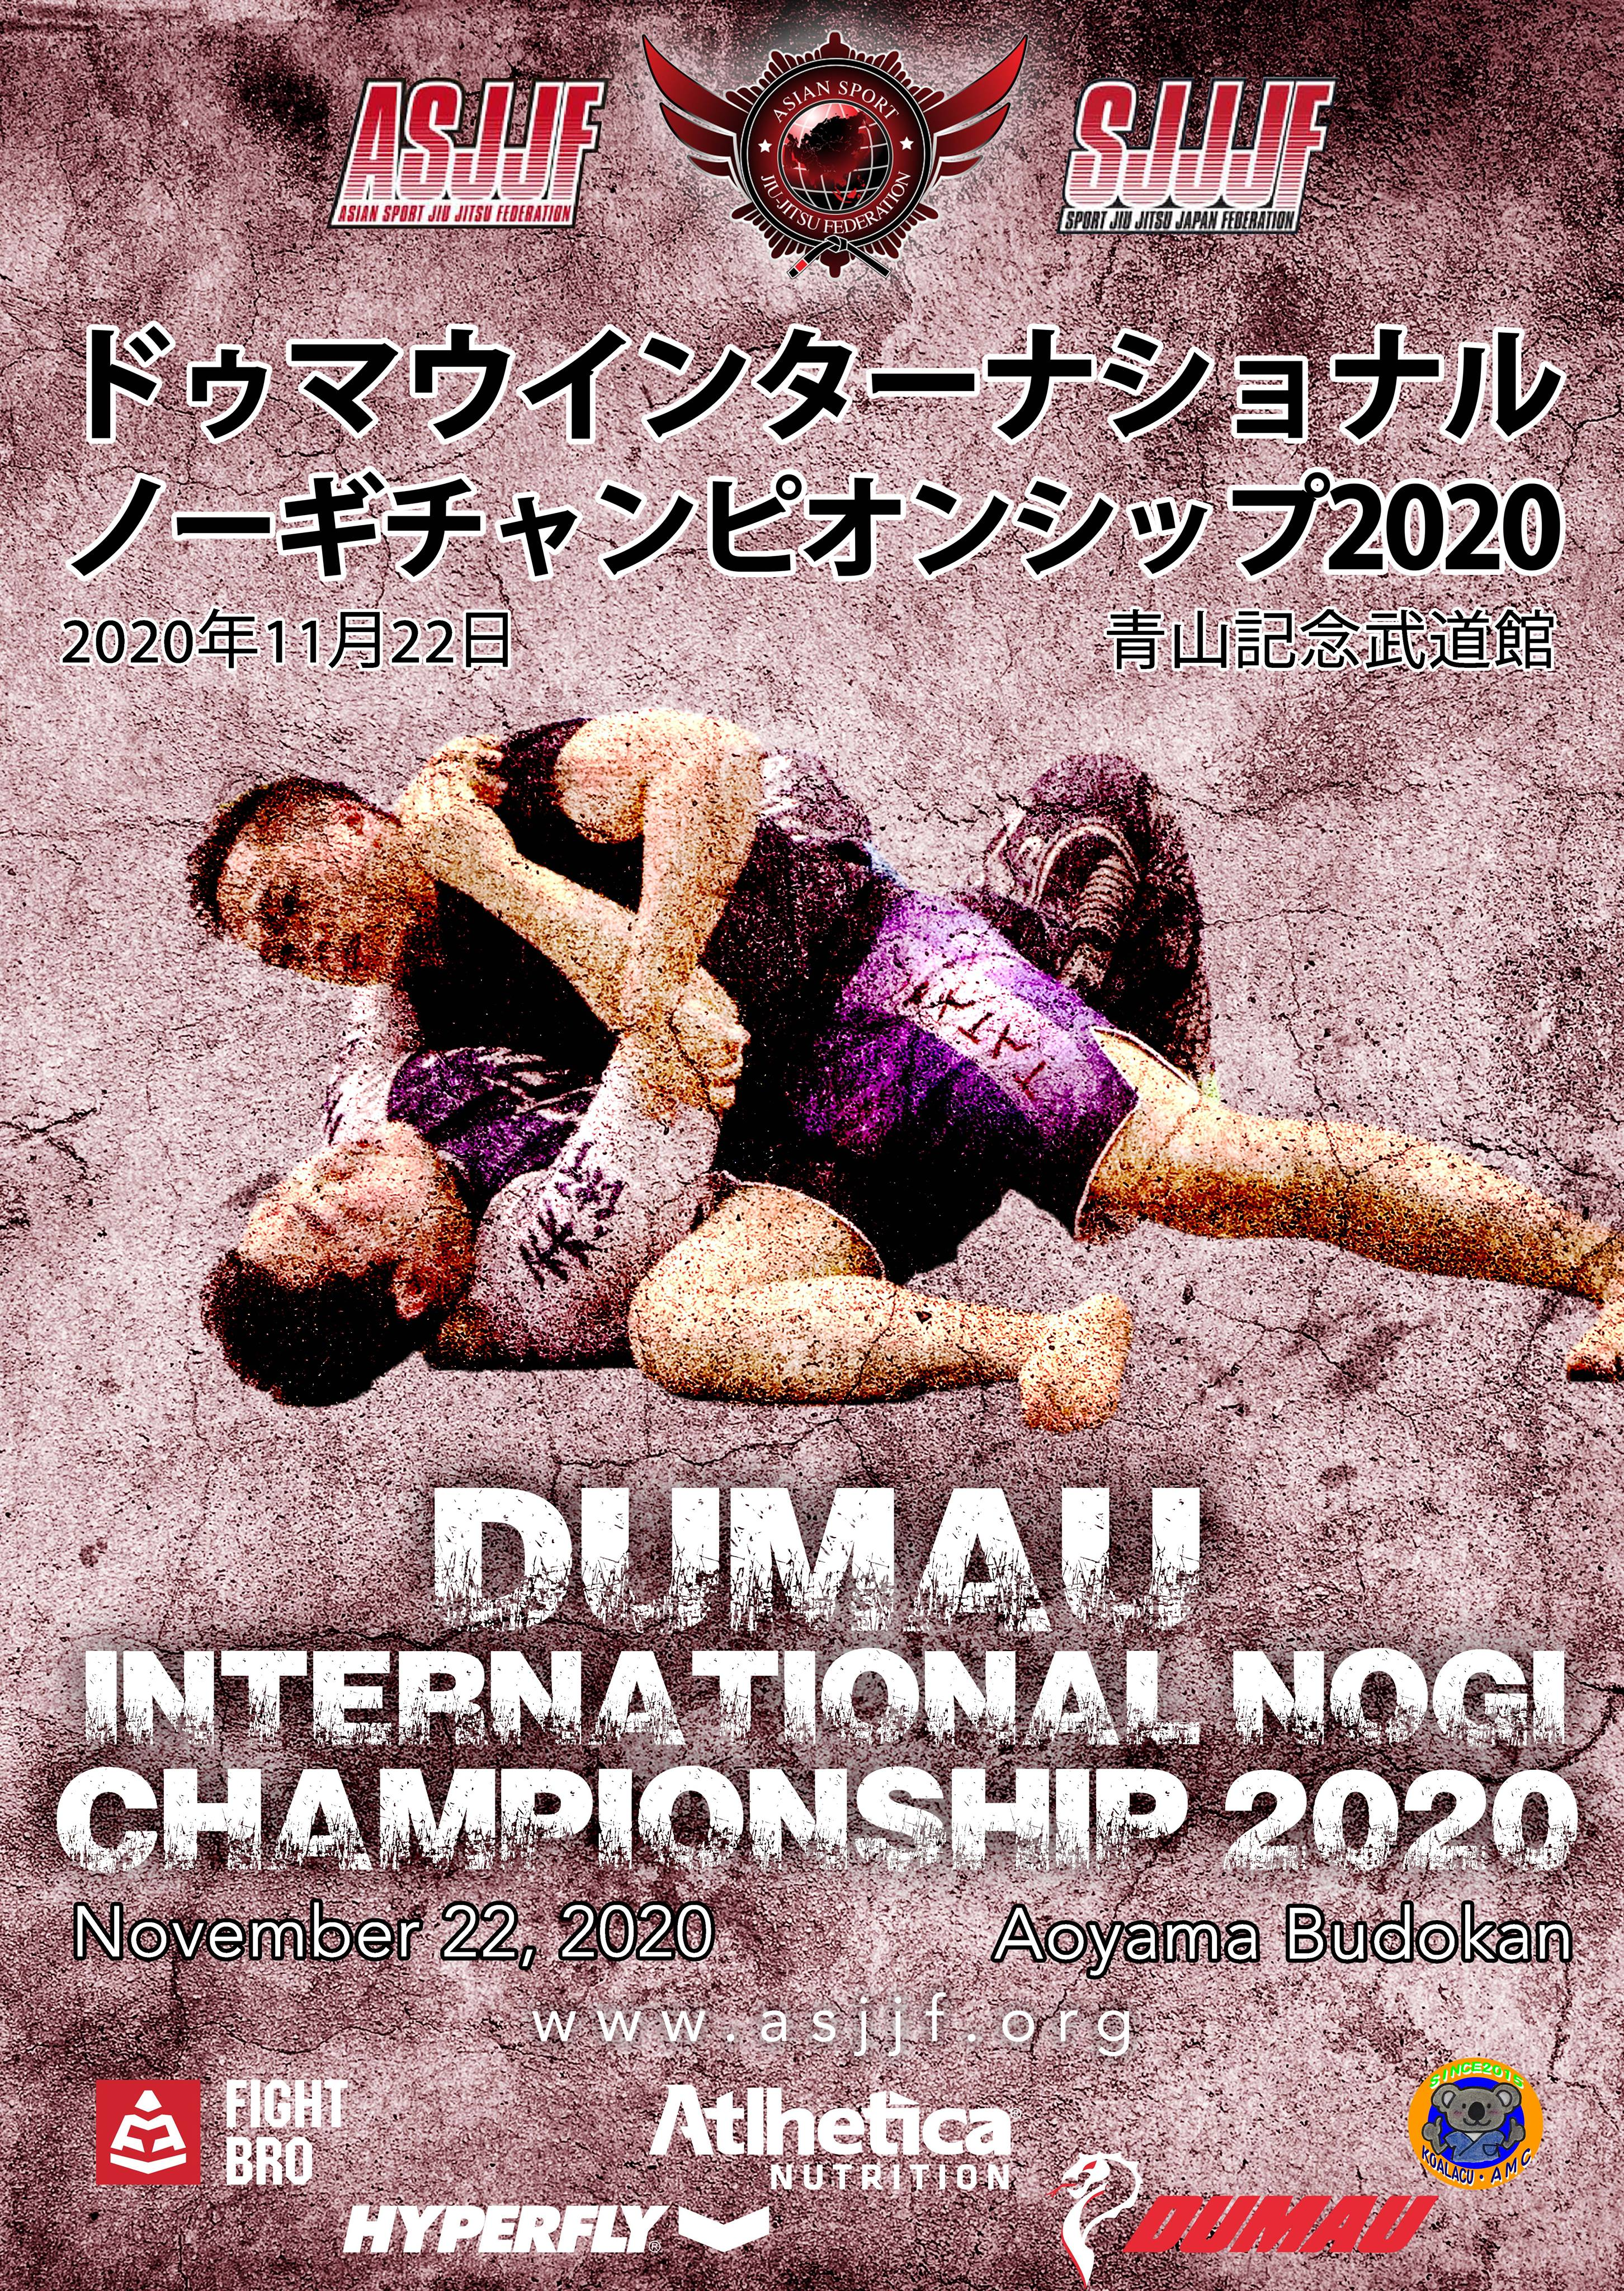 asjjf dumau international nogi championship 2020 (ドゥマウインターナショナルノーギチャンピオンシップ)